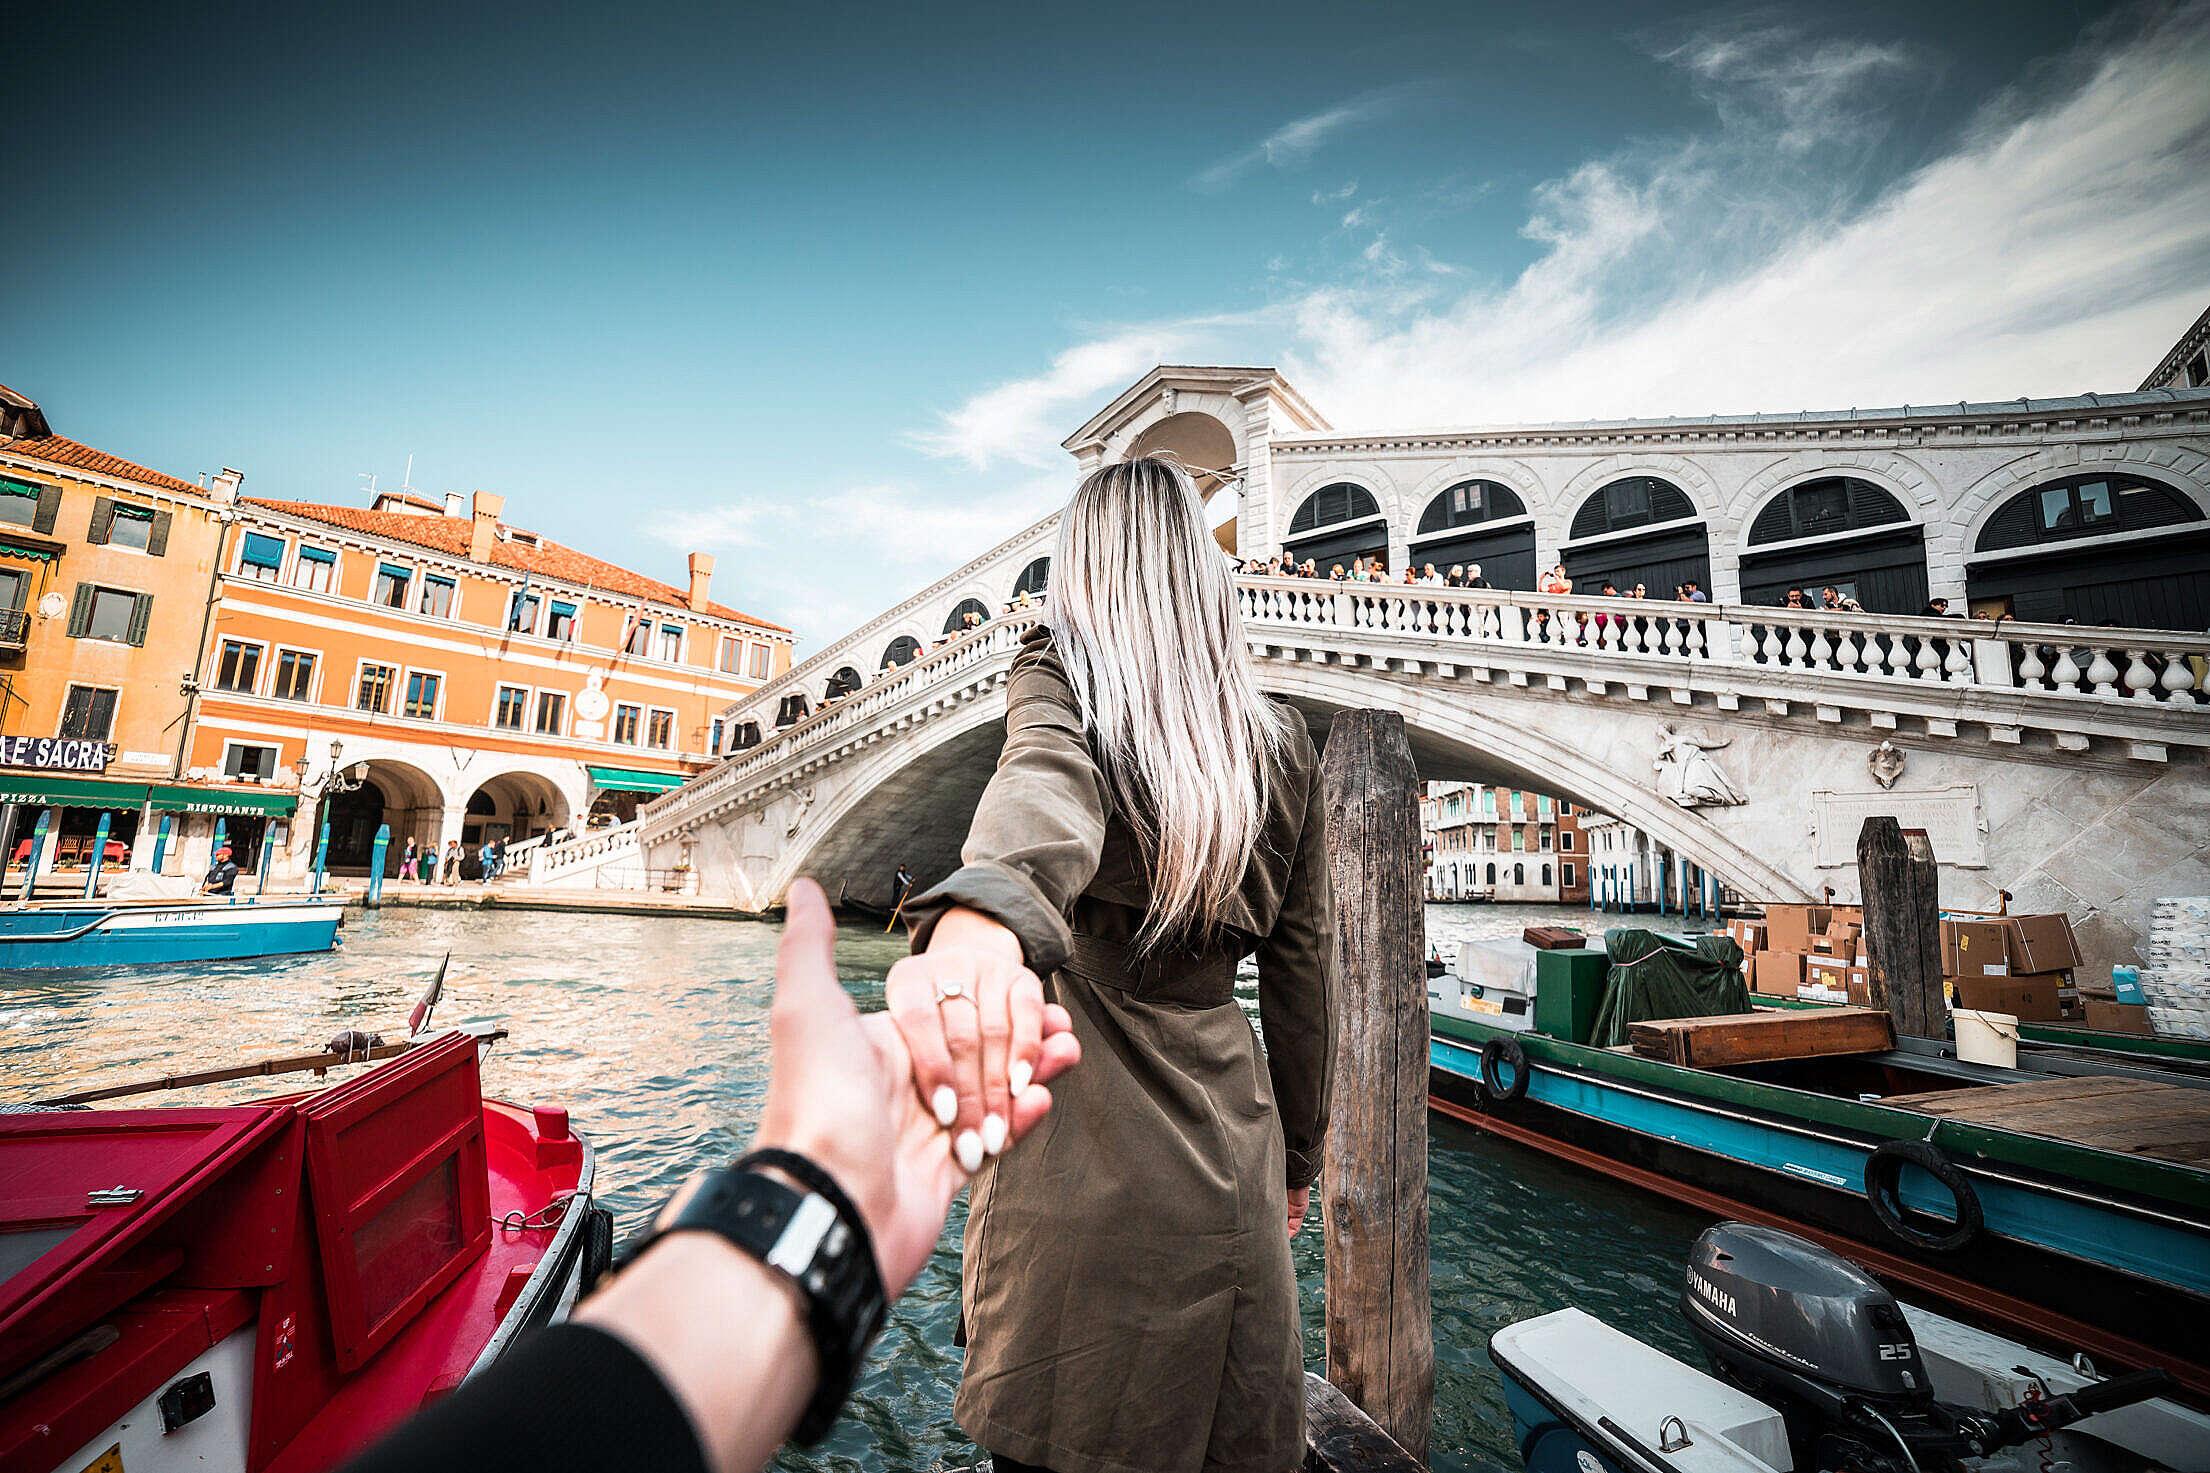 Couple in Follow Me To Pose in Front of Rialto Bridge, Venice Free Stock Photo